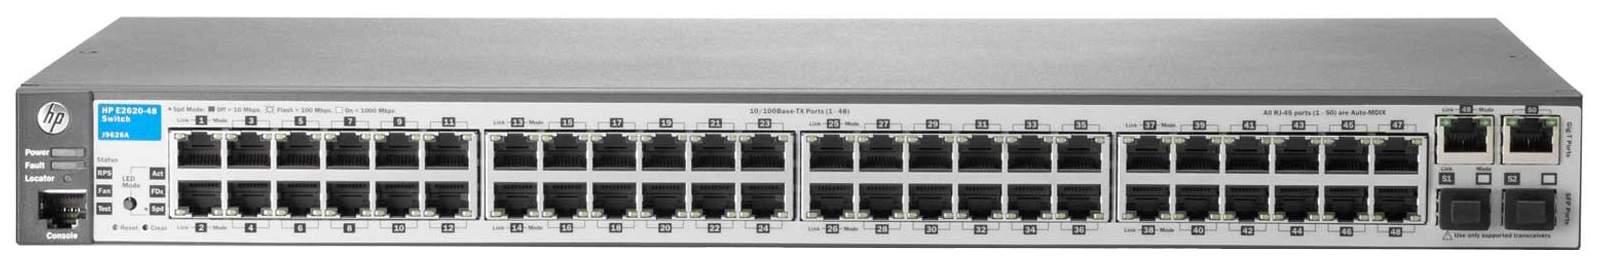 Коммутатор HP 2620-48 J9626A Серый